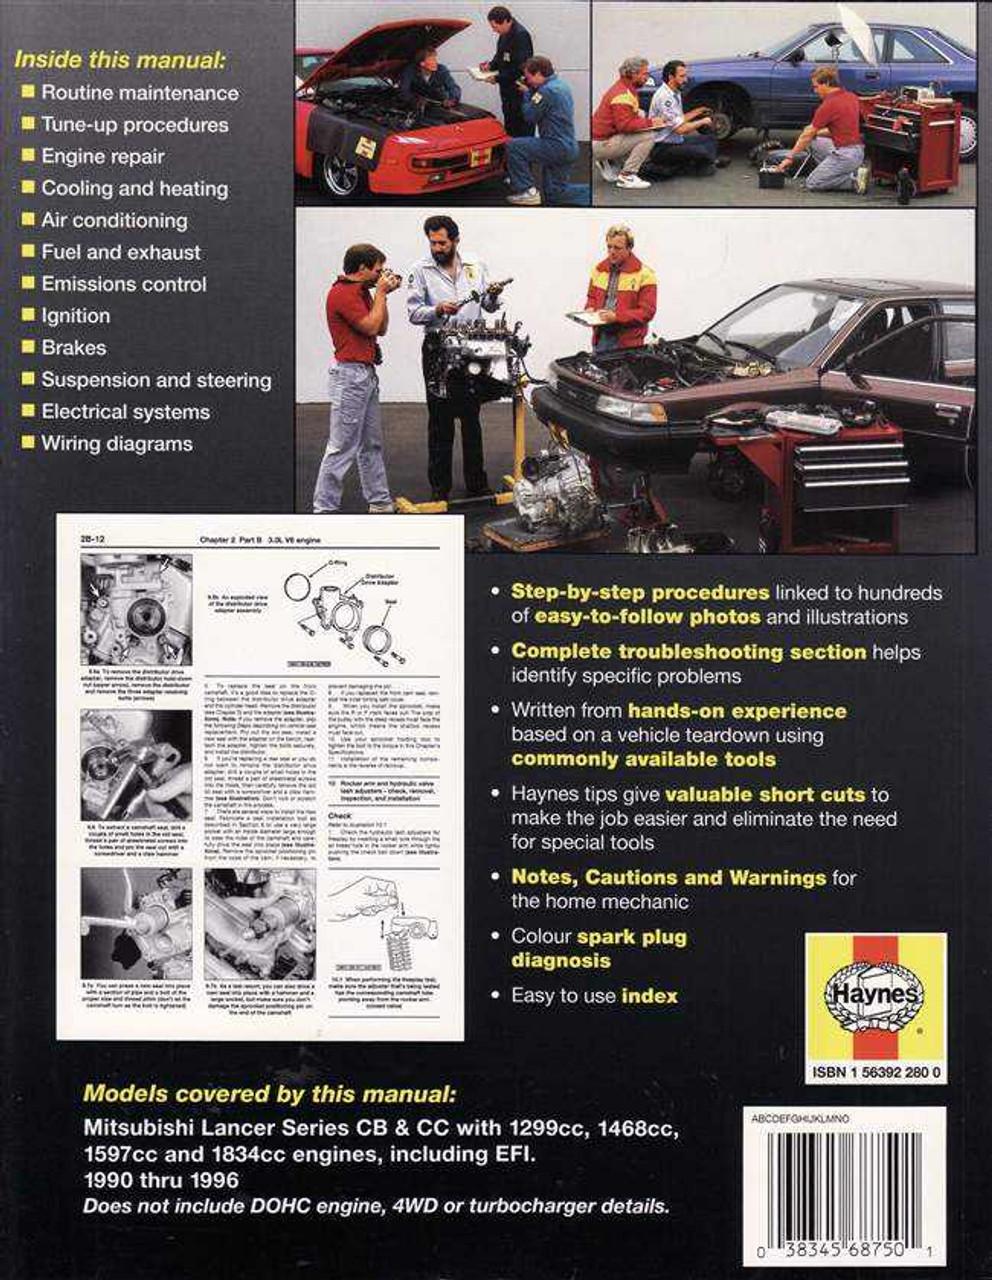 mitsubishi lancer cb amp cc 1990 1996 workshop manual rh automotobookshop com au Mygmlink Owner's Manual Clymer Manuals